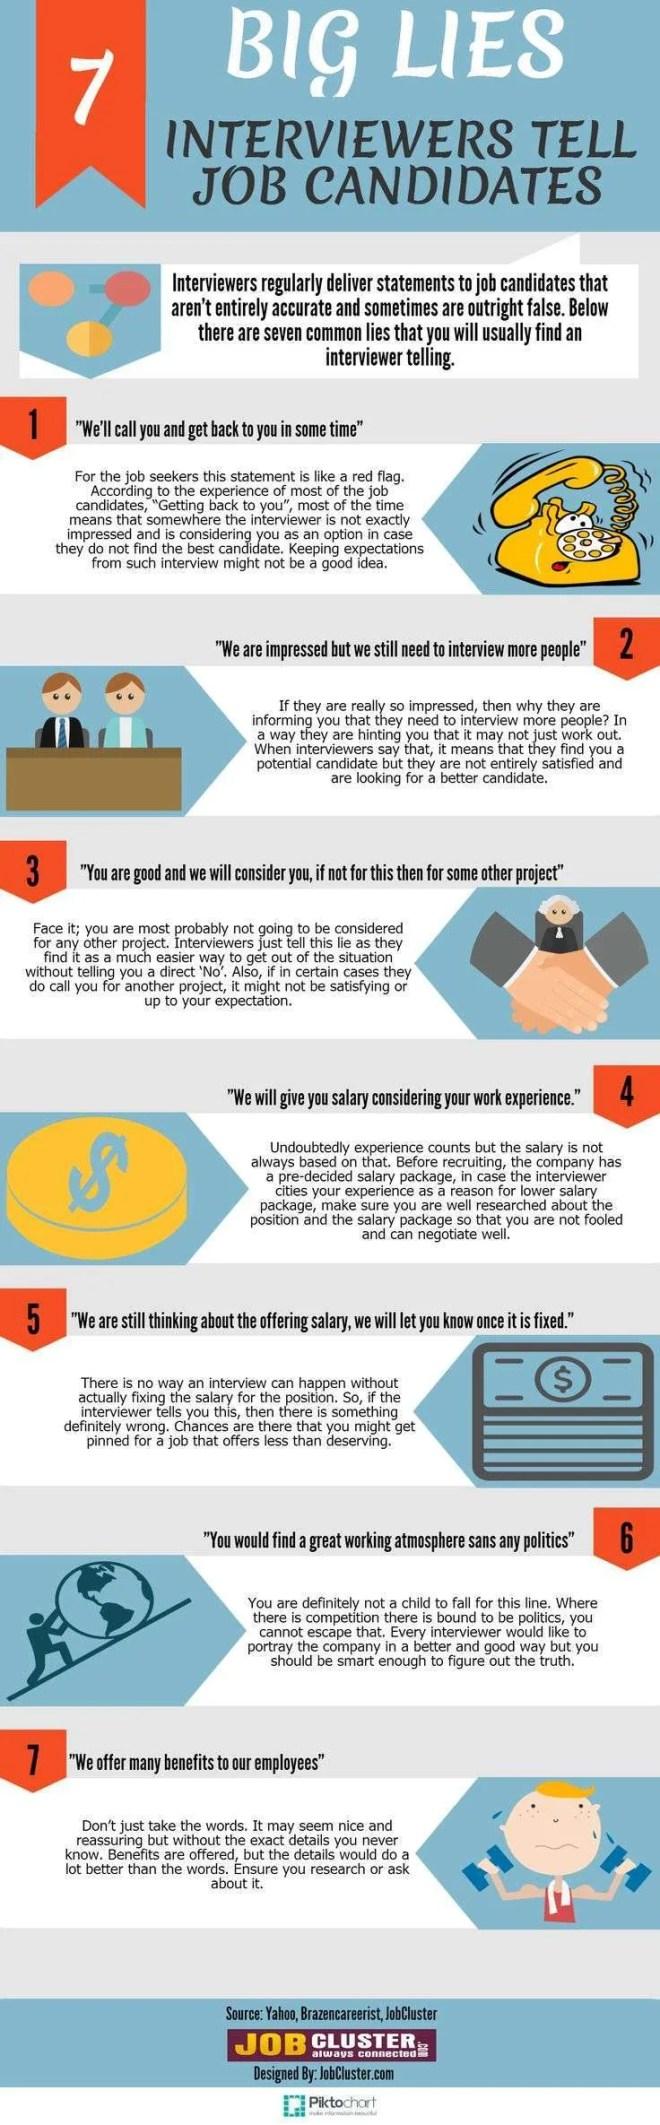 7 Big lies Interviewers tell Job candidates 2 7 Big Lies Interviewers Tell Job Candidates  Infographic